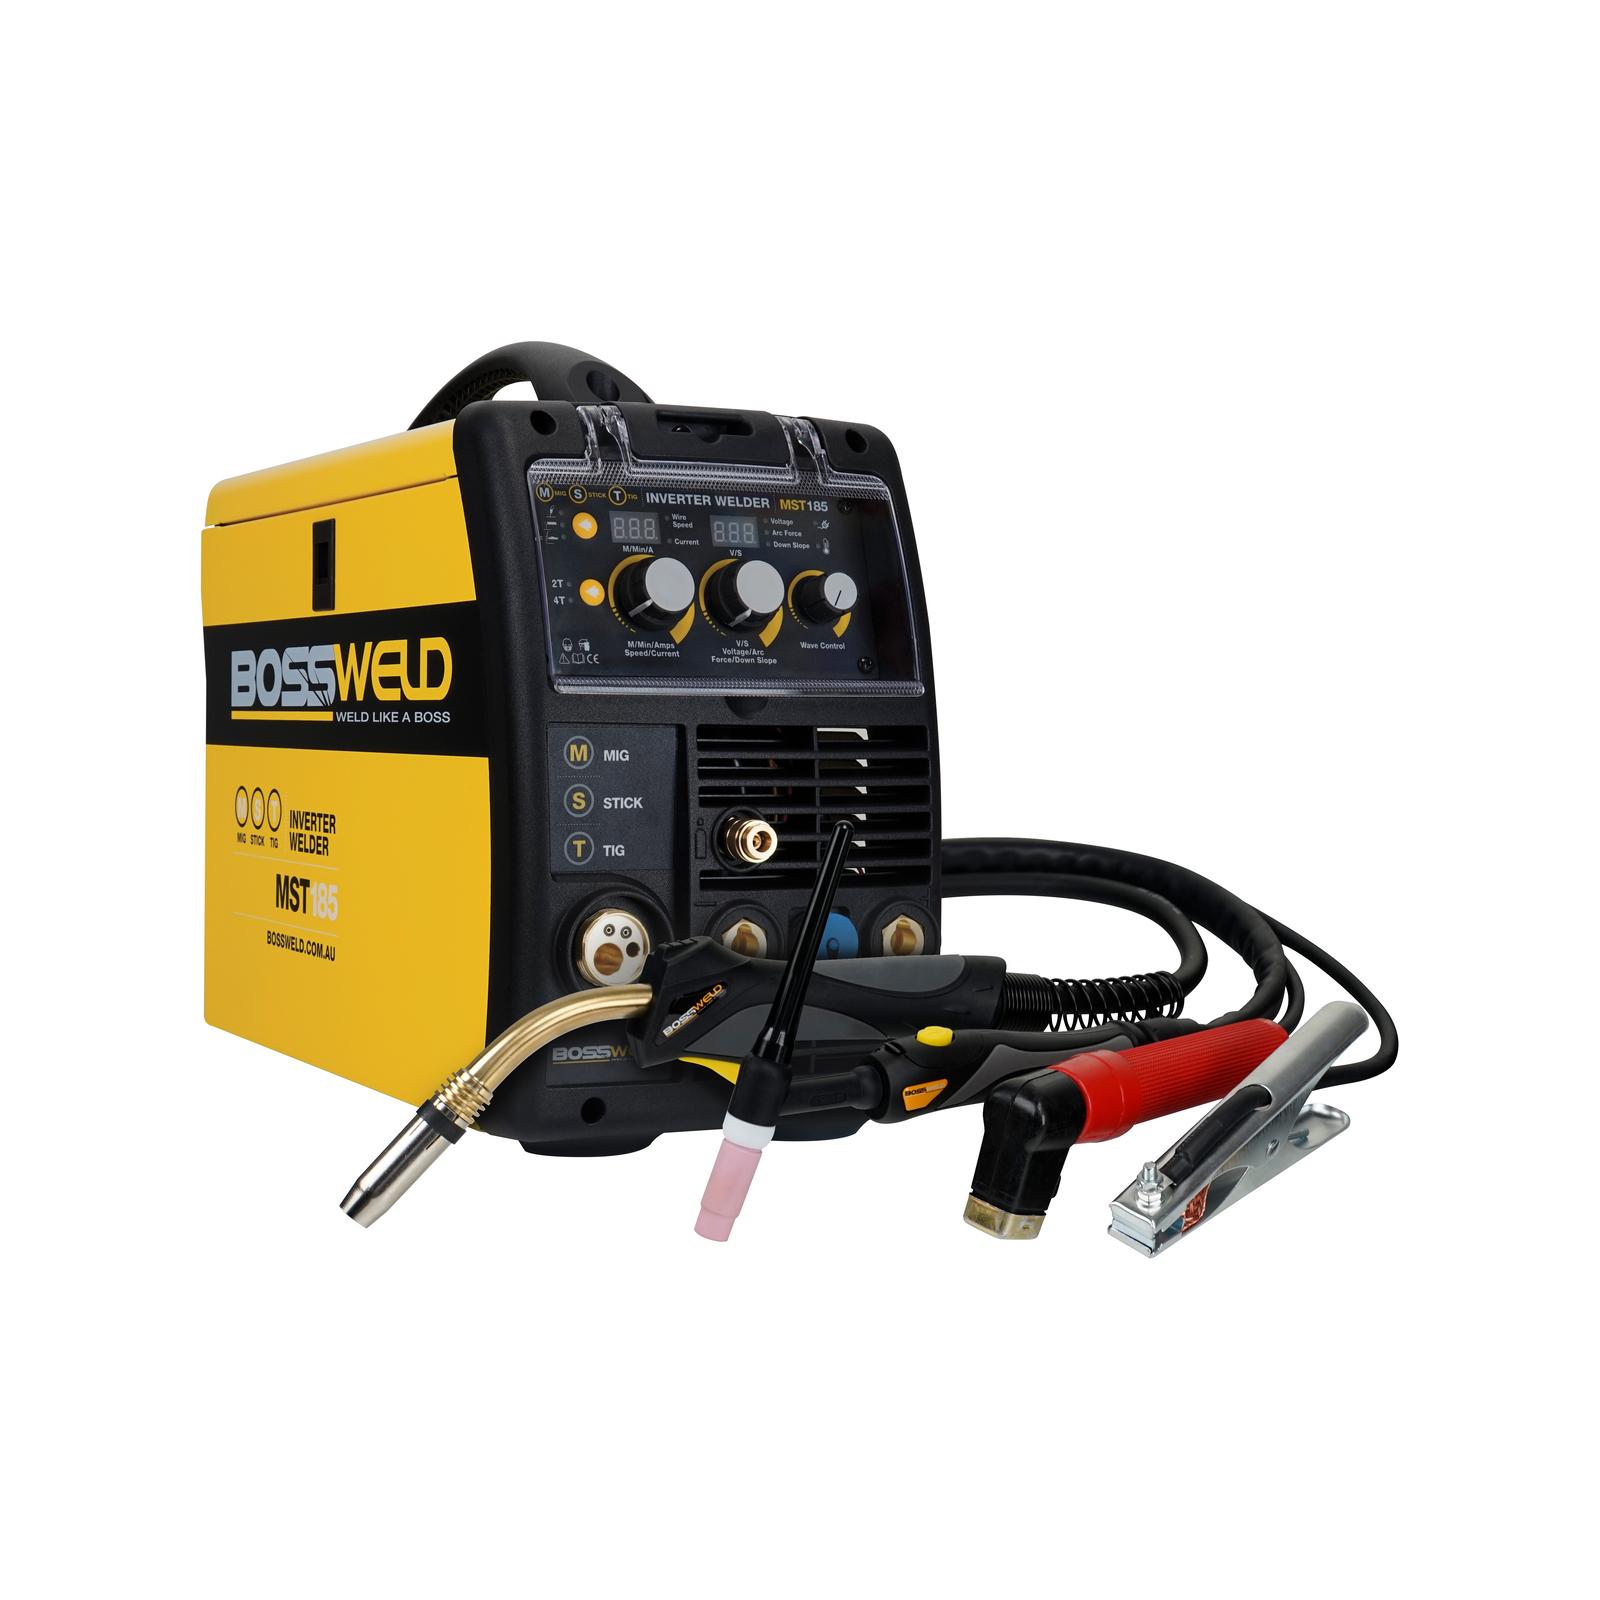 Bossweld 180A MST185 Plus MIG Stick Arc And TIG Inverter Welder